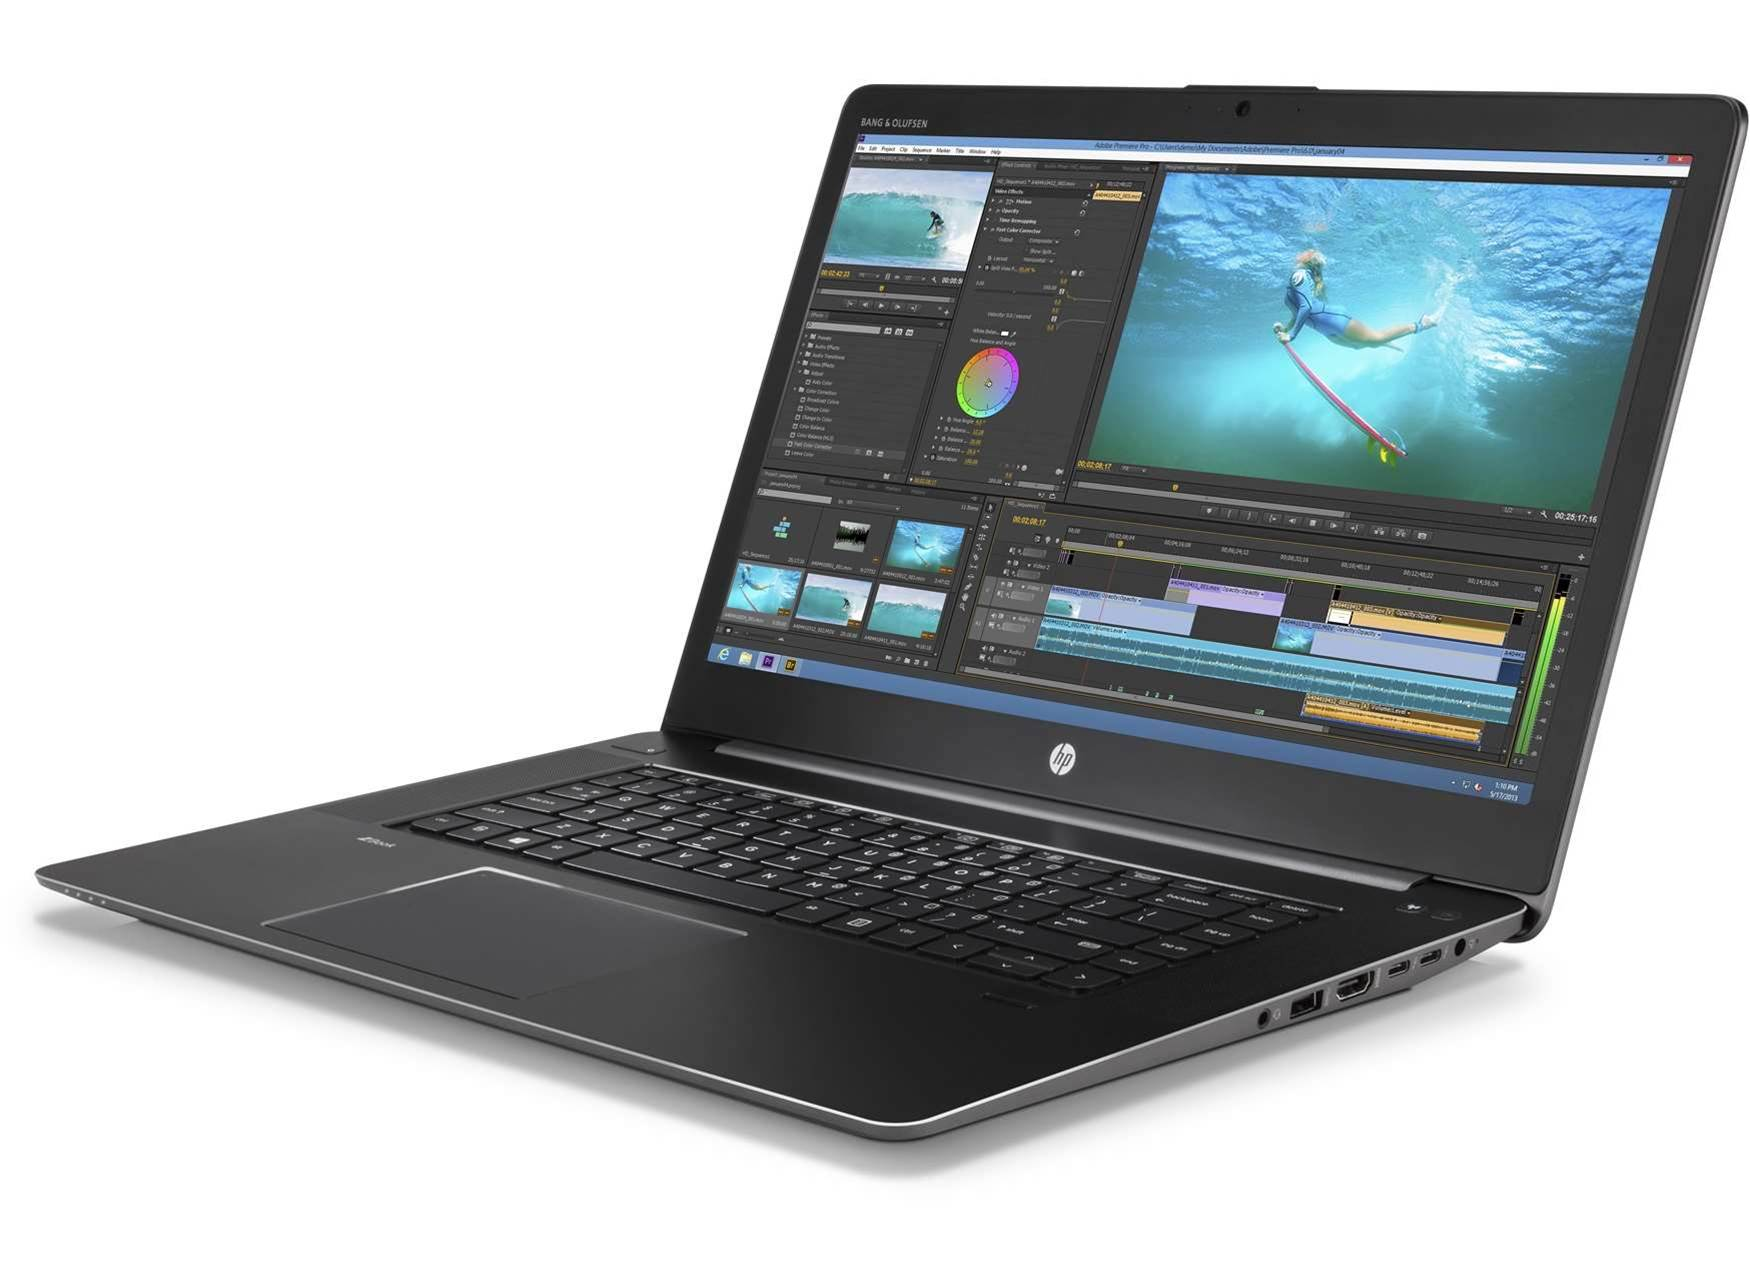 Review: HP ZBook Studio G3